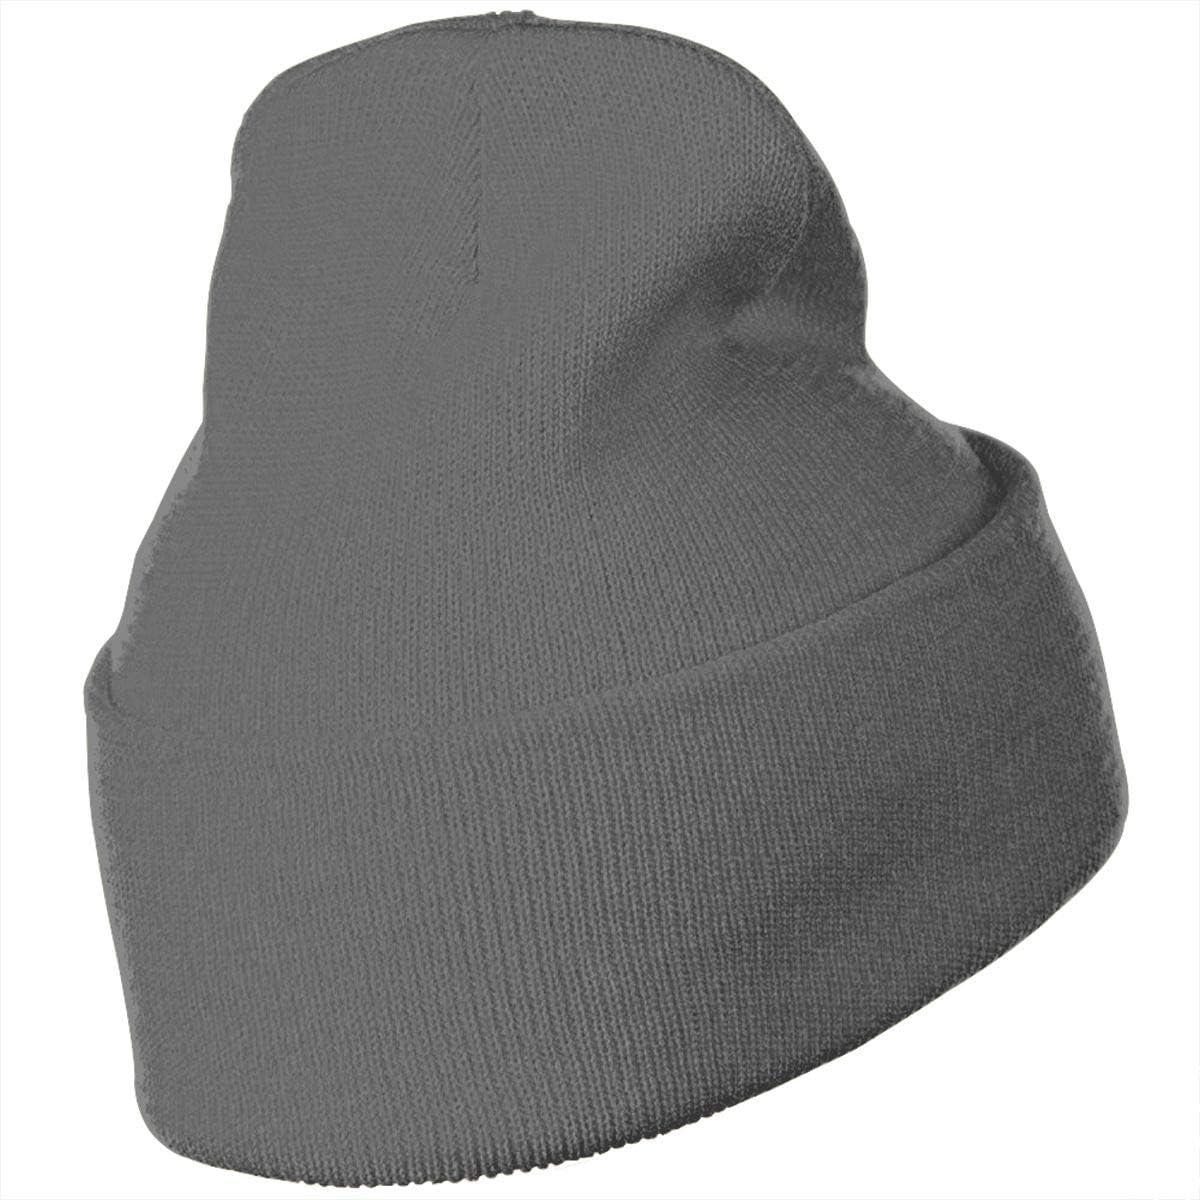 Yubb7E Pattern Warm Knit Winter Solid Beanie Hat Unisex Skull Cap